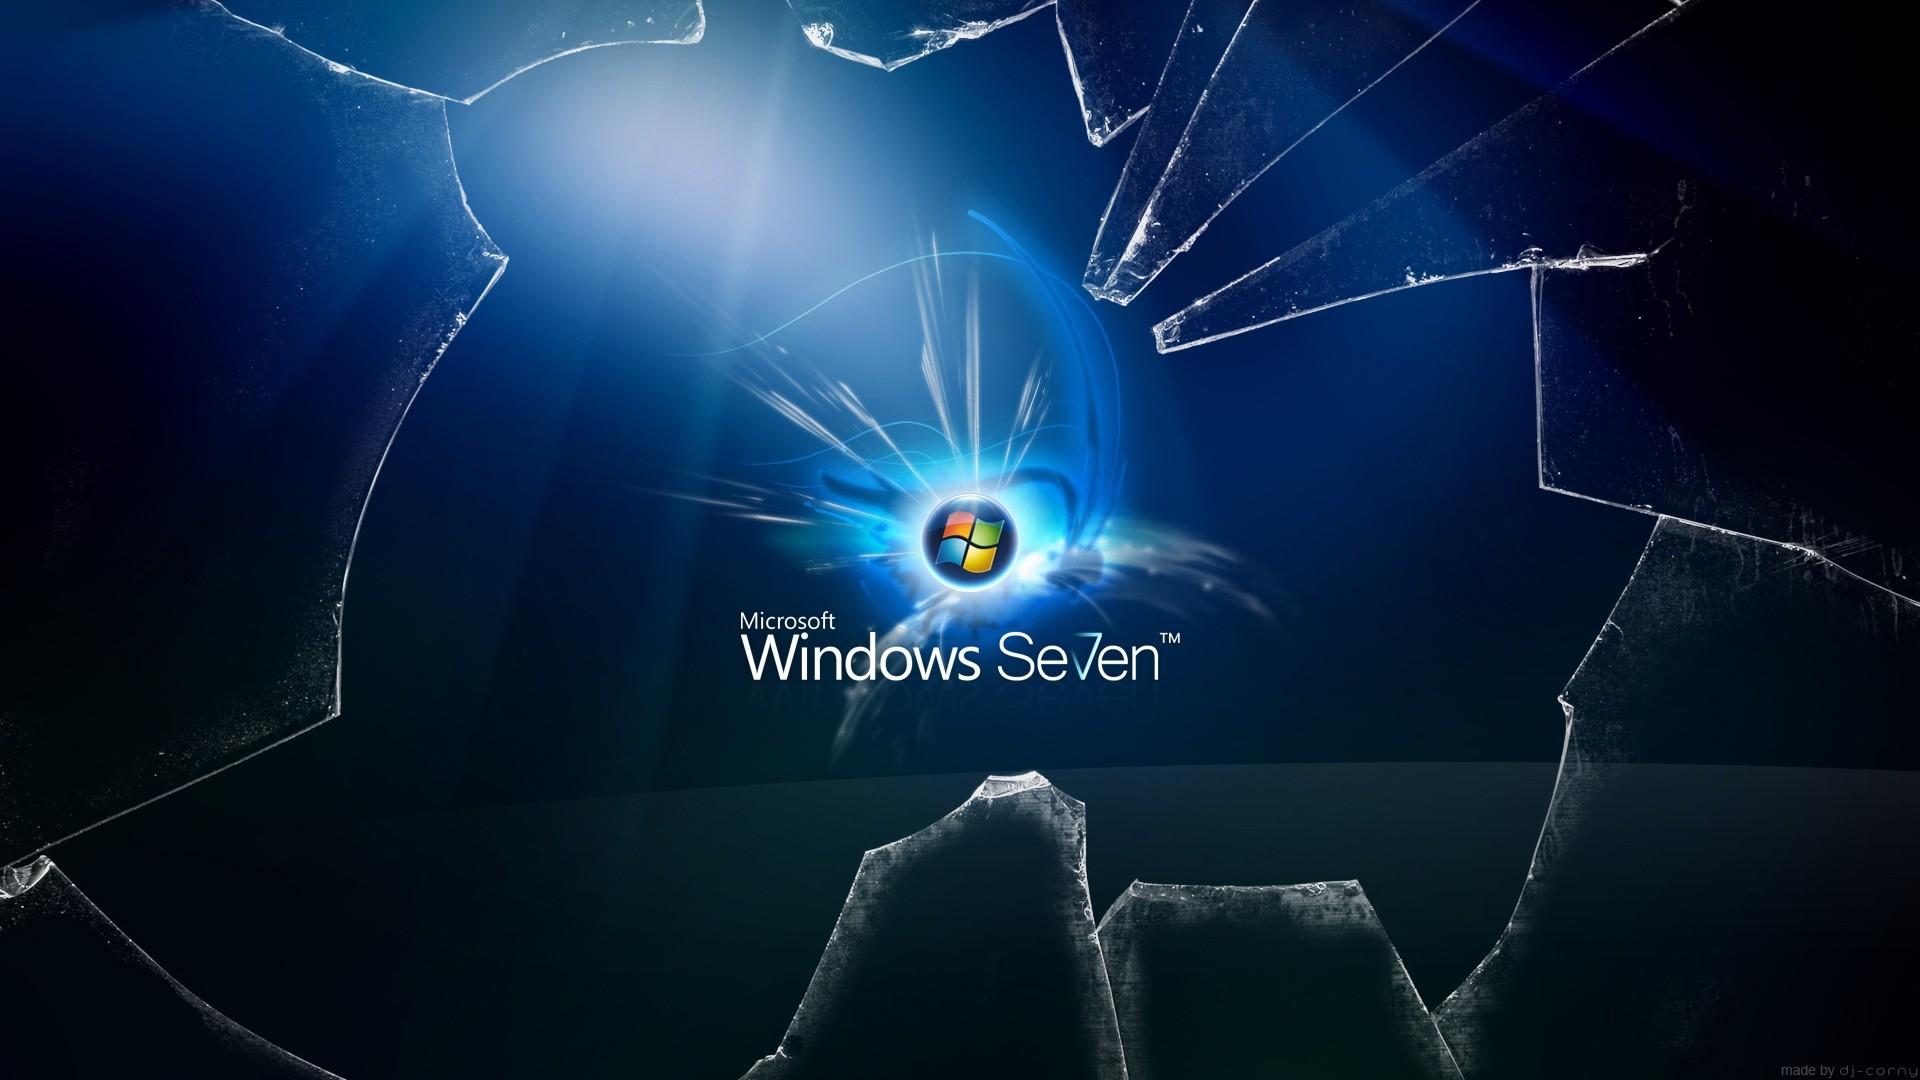 Windows WallpaperWallpaper Hub Wallpaper Hub Windows 7 Wallpapers HD For Desktop  Wallpapers)